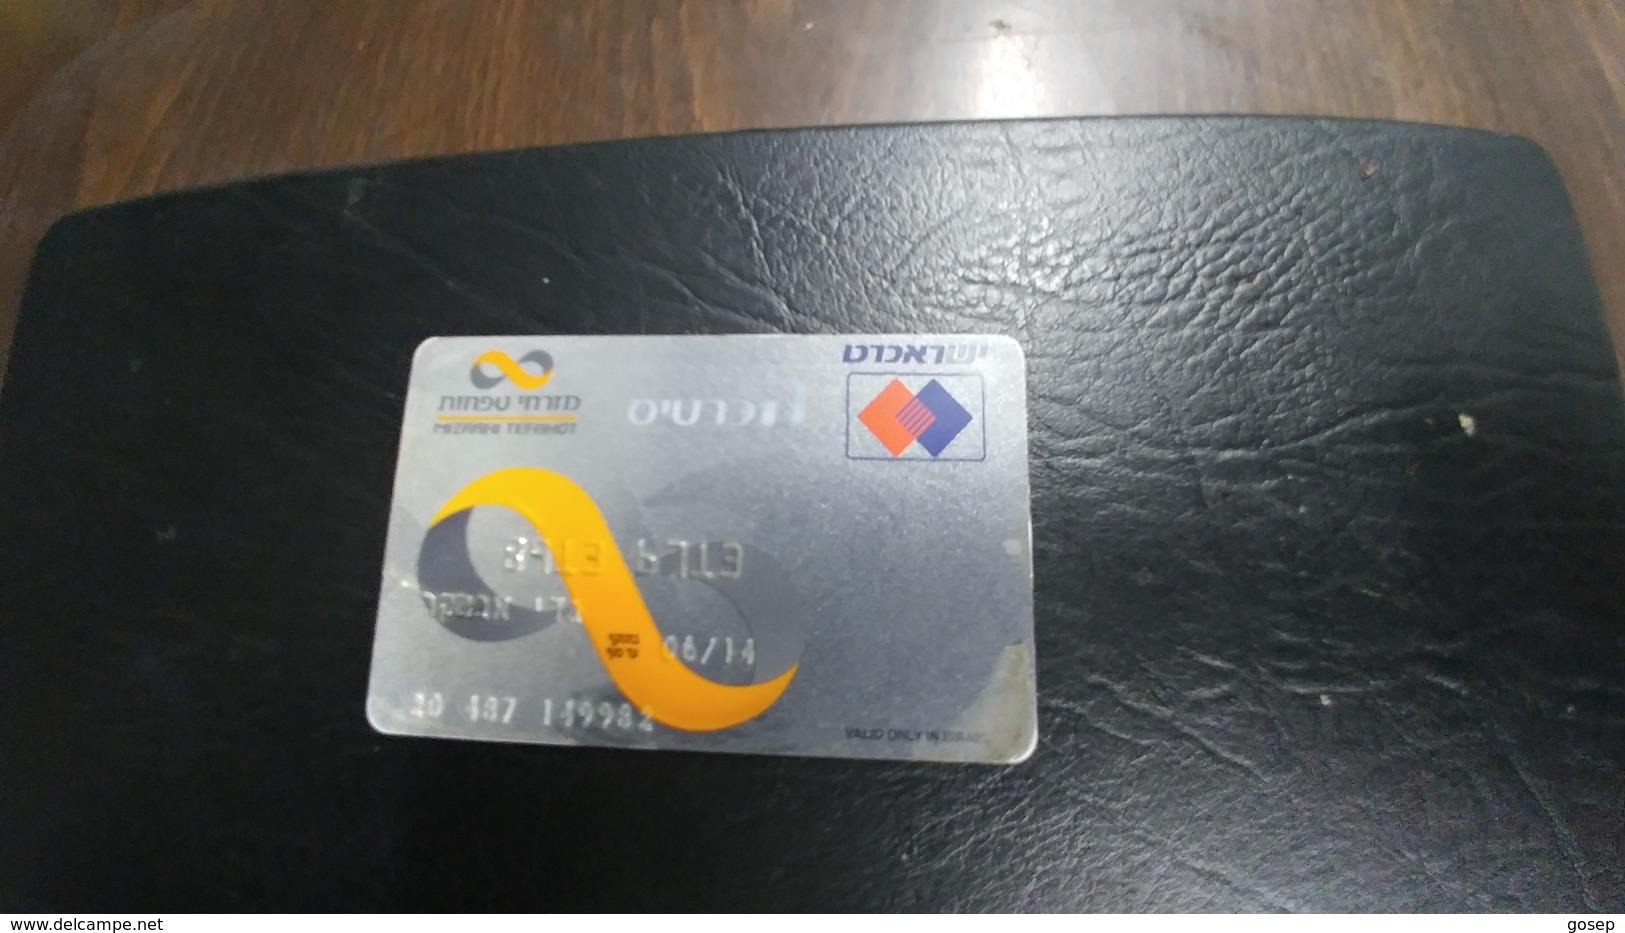 Israel-credict Card-(129)-(lokking From 2 Side This Card)-(6713) - Geldkarten (Ablauf Min. 10 Jahre)